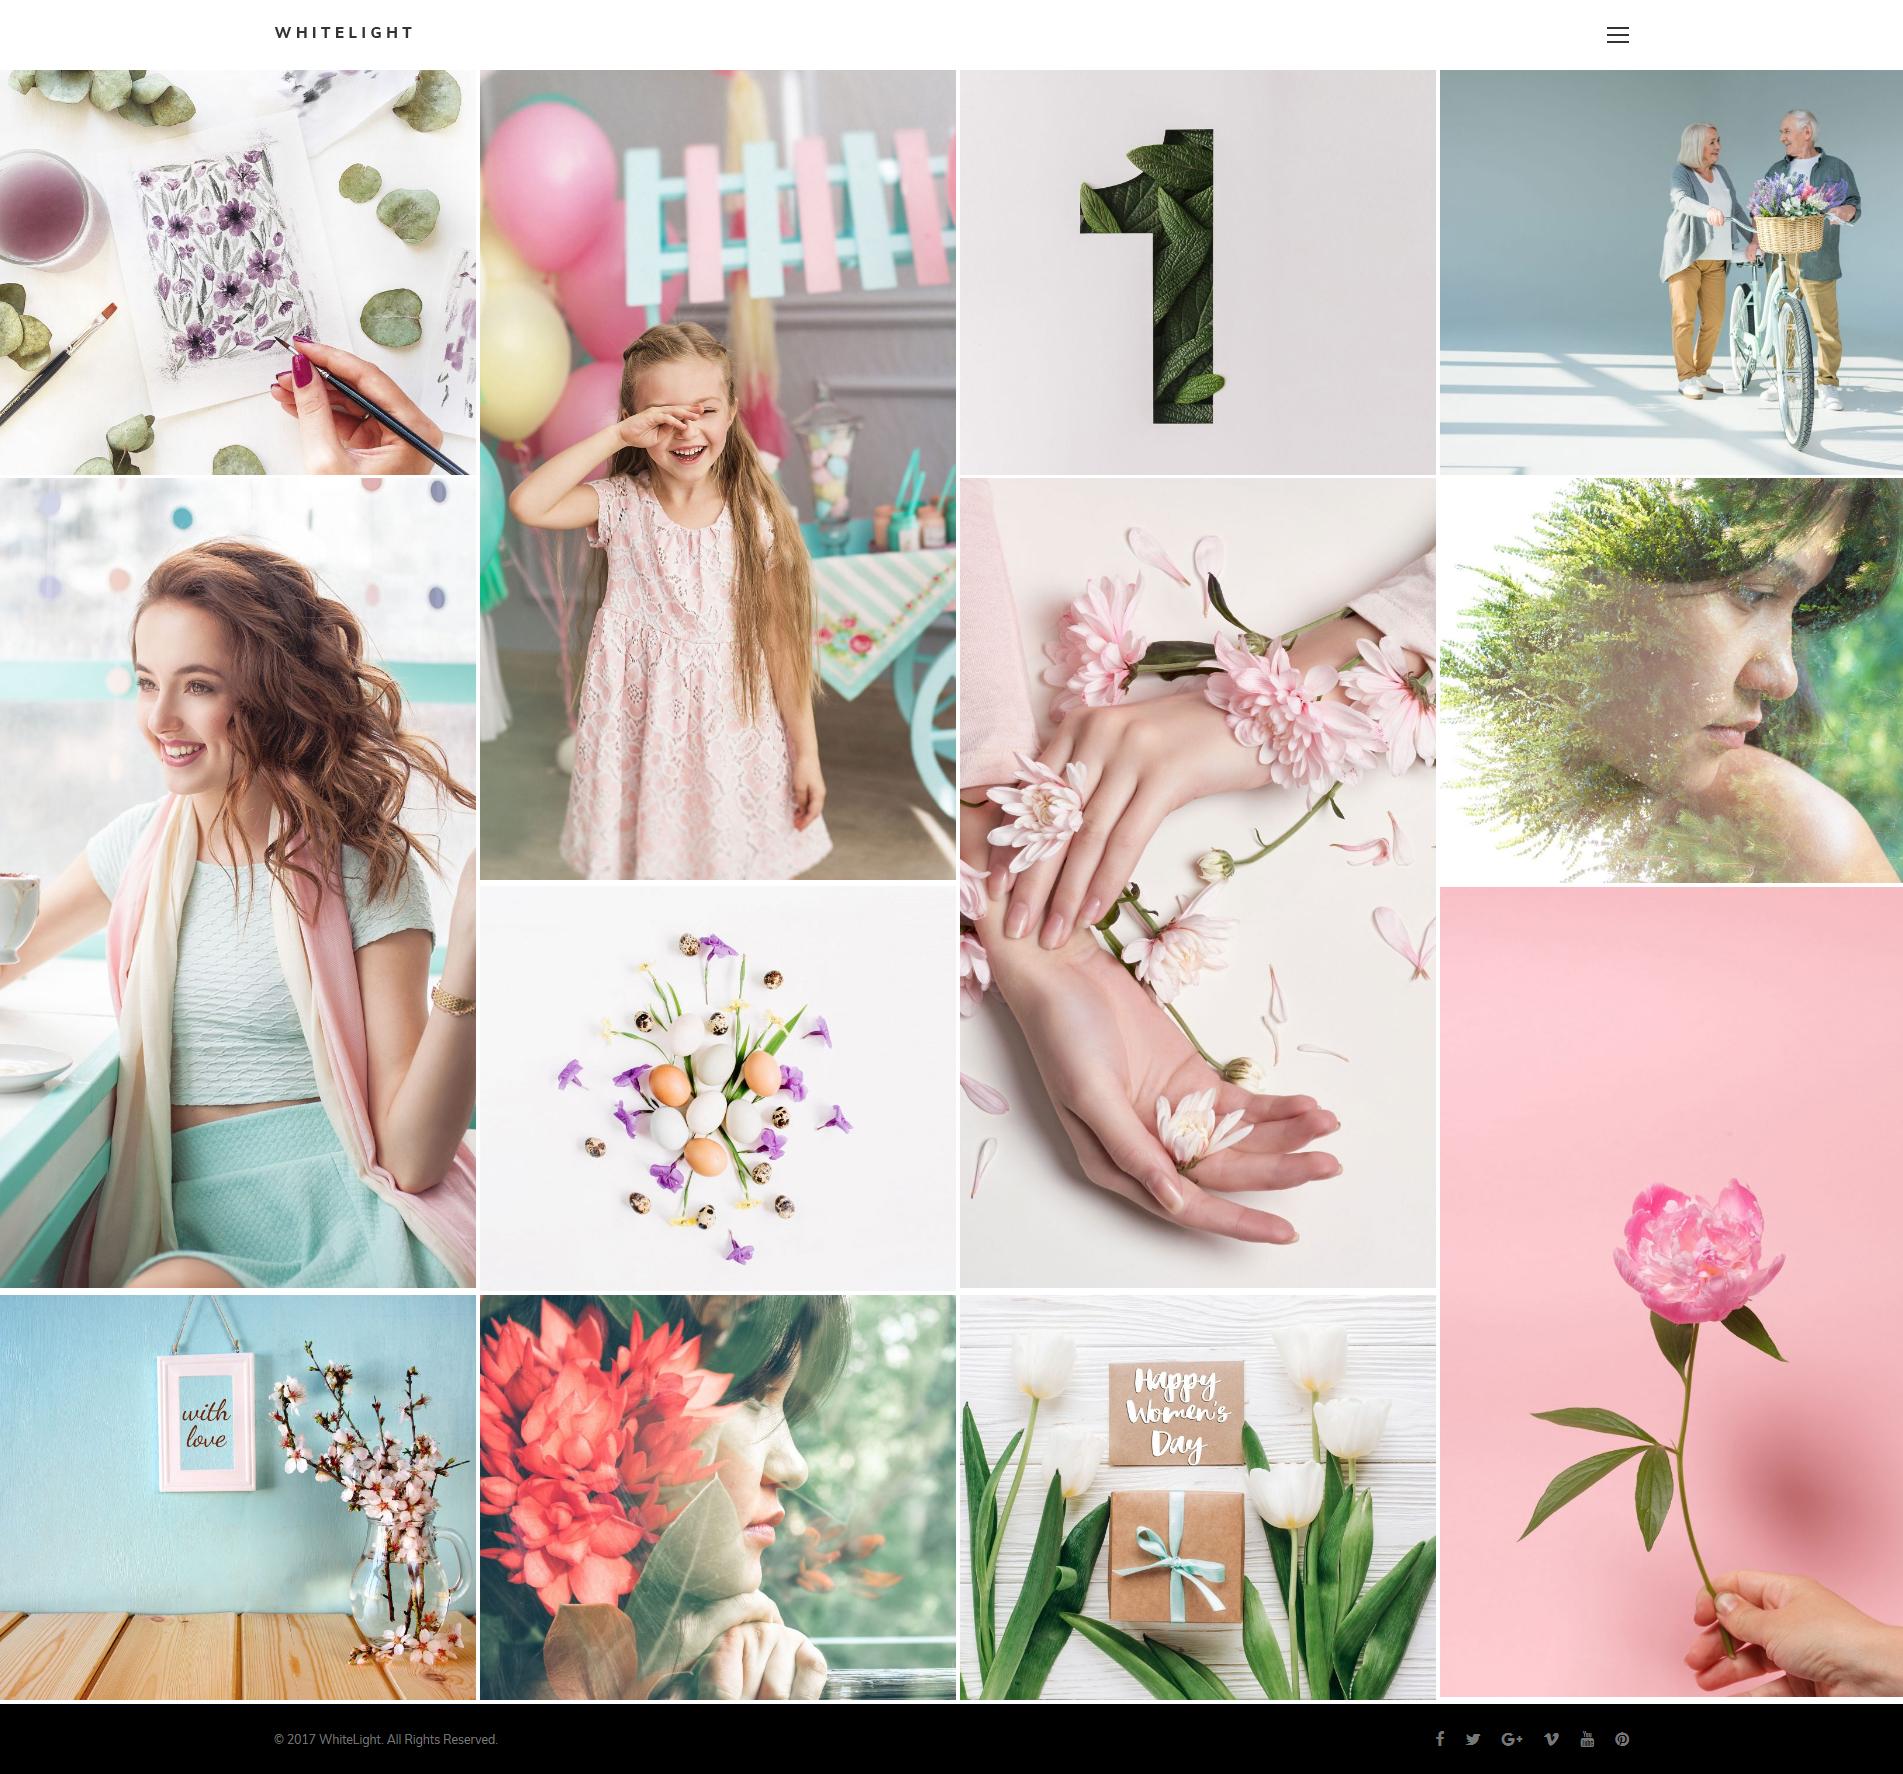 WhiteLight - professional photographer portfolio №64037 - скриншот